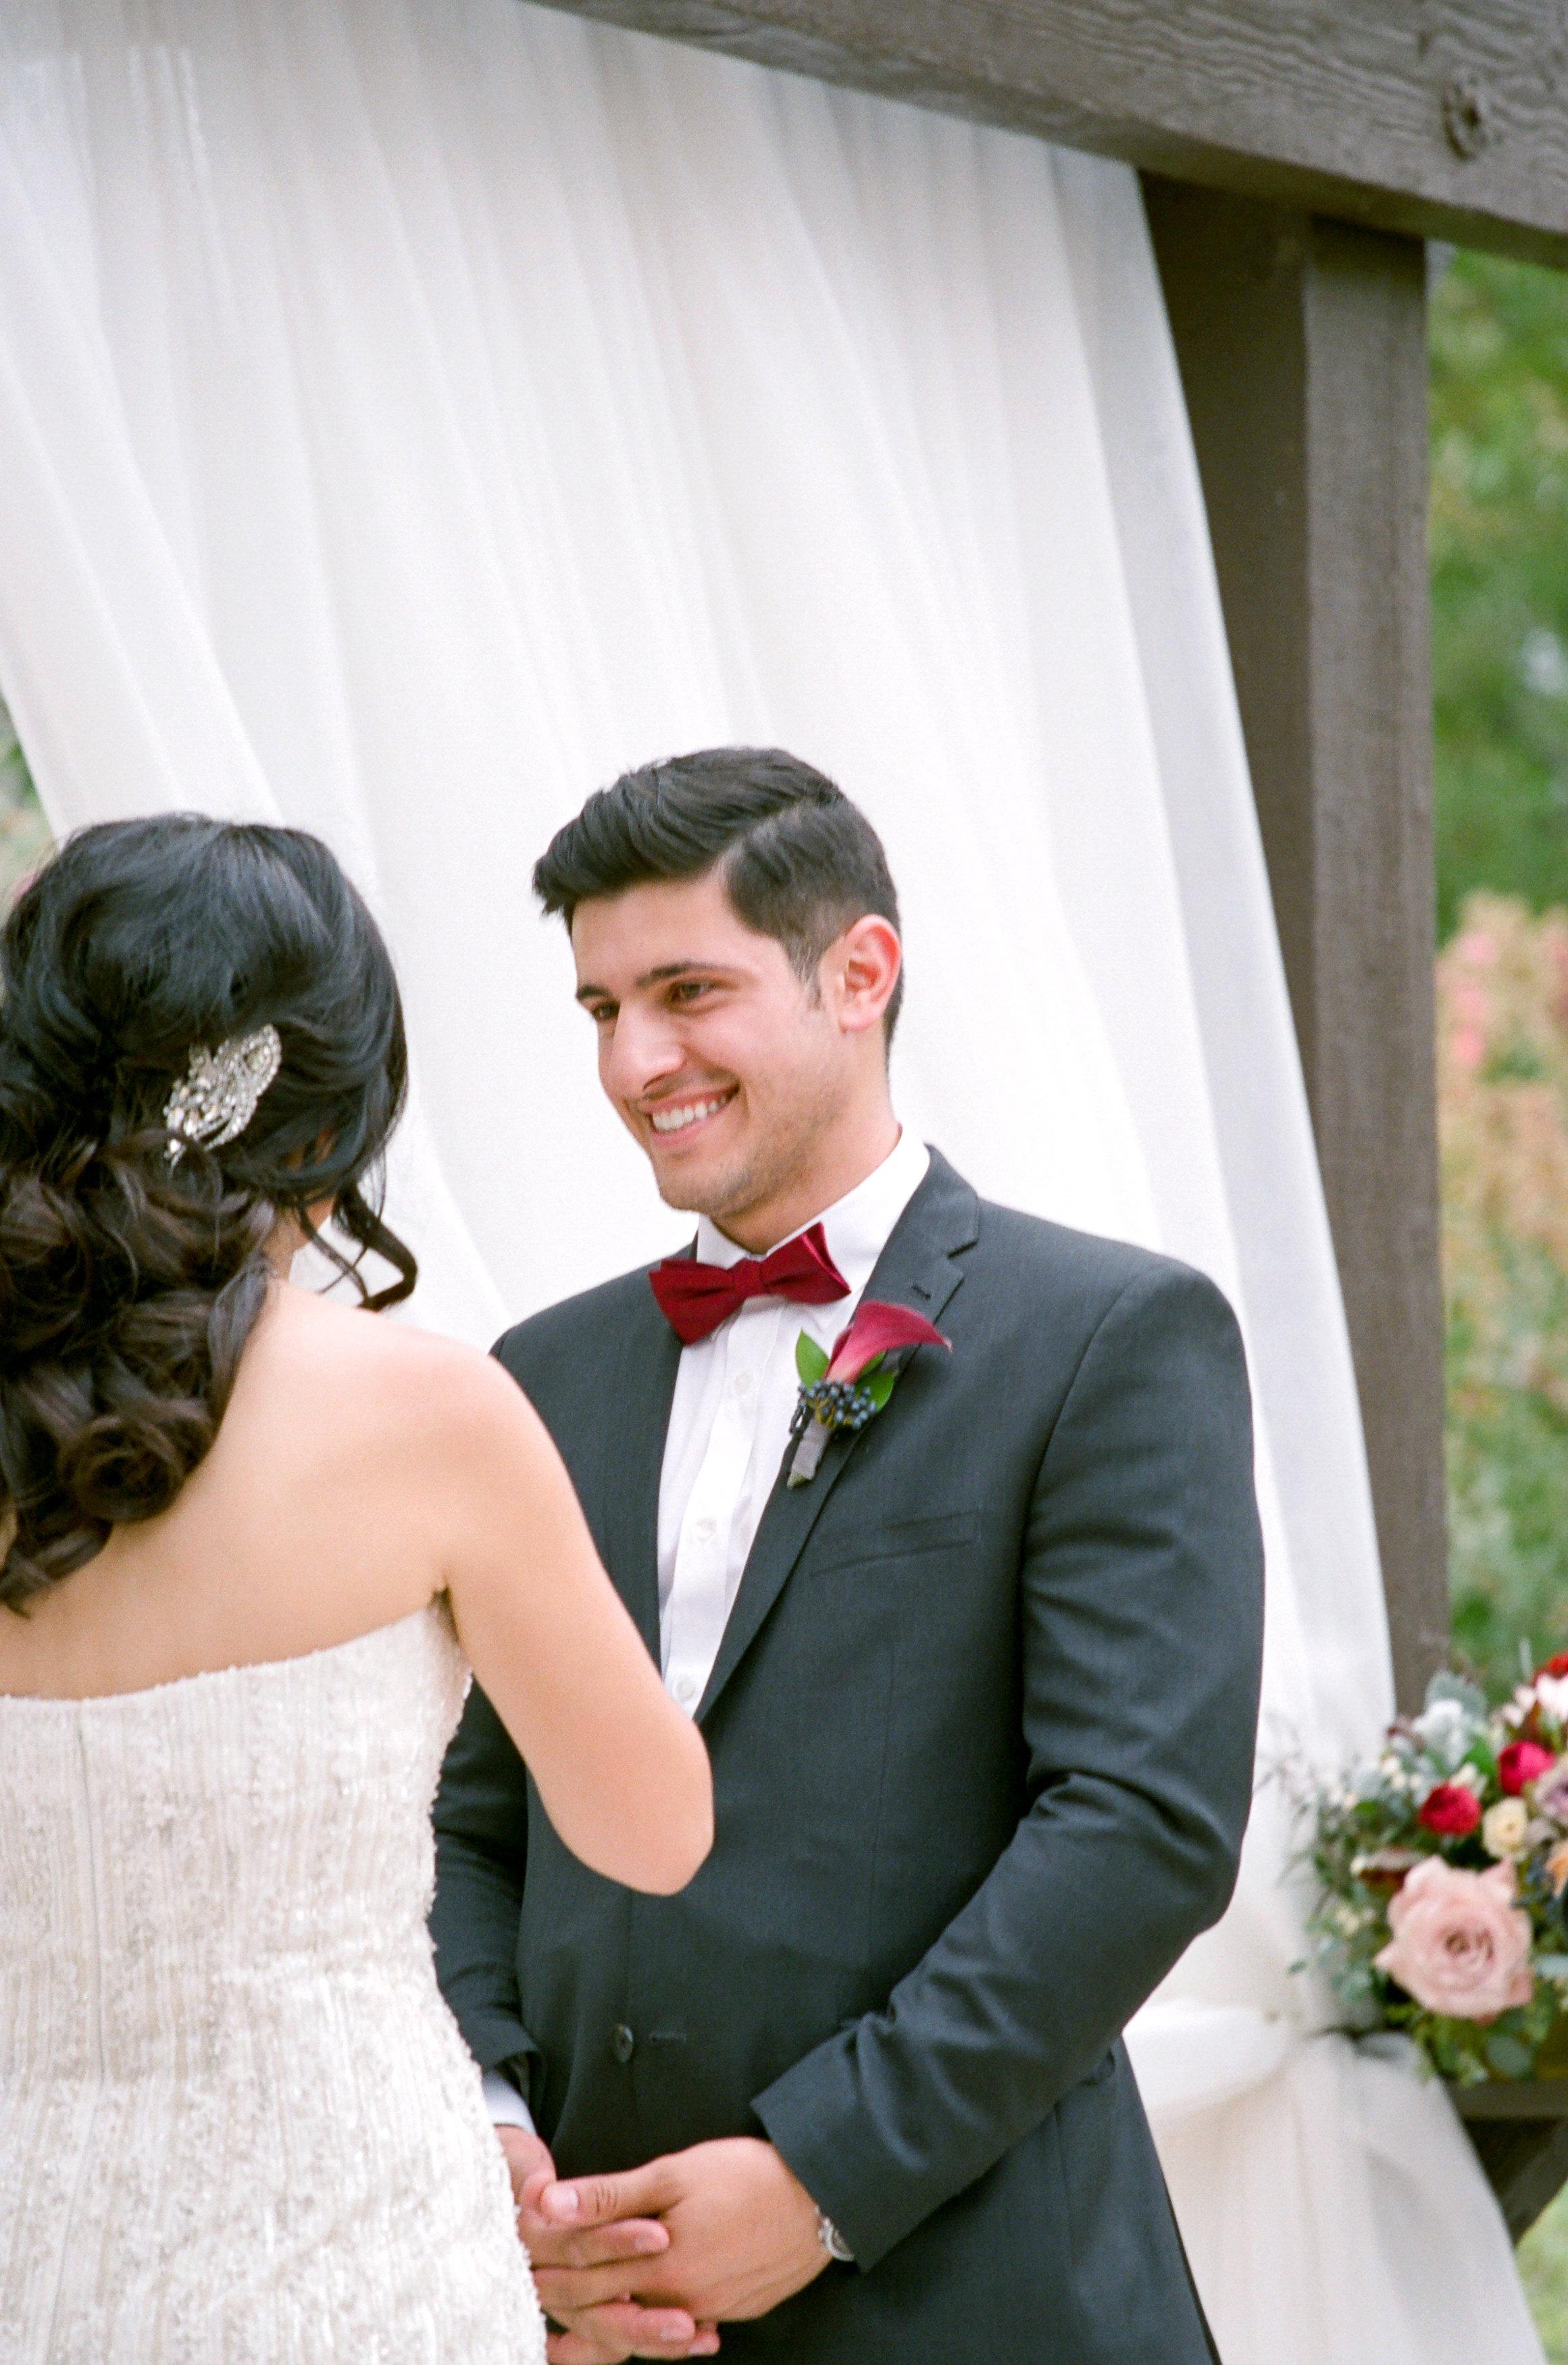 Amador_County_Wedding_Vows_Draping_Rancho_Victoria_Vineyard_Northern_California.jpg